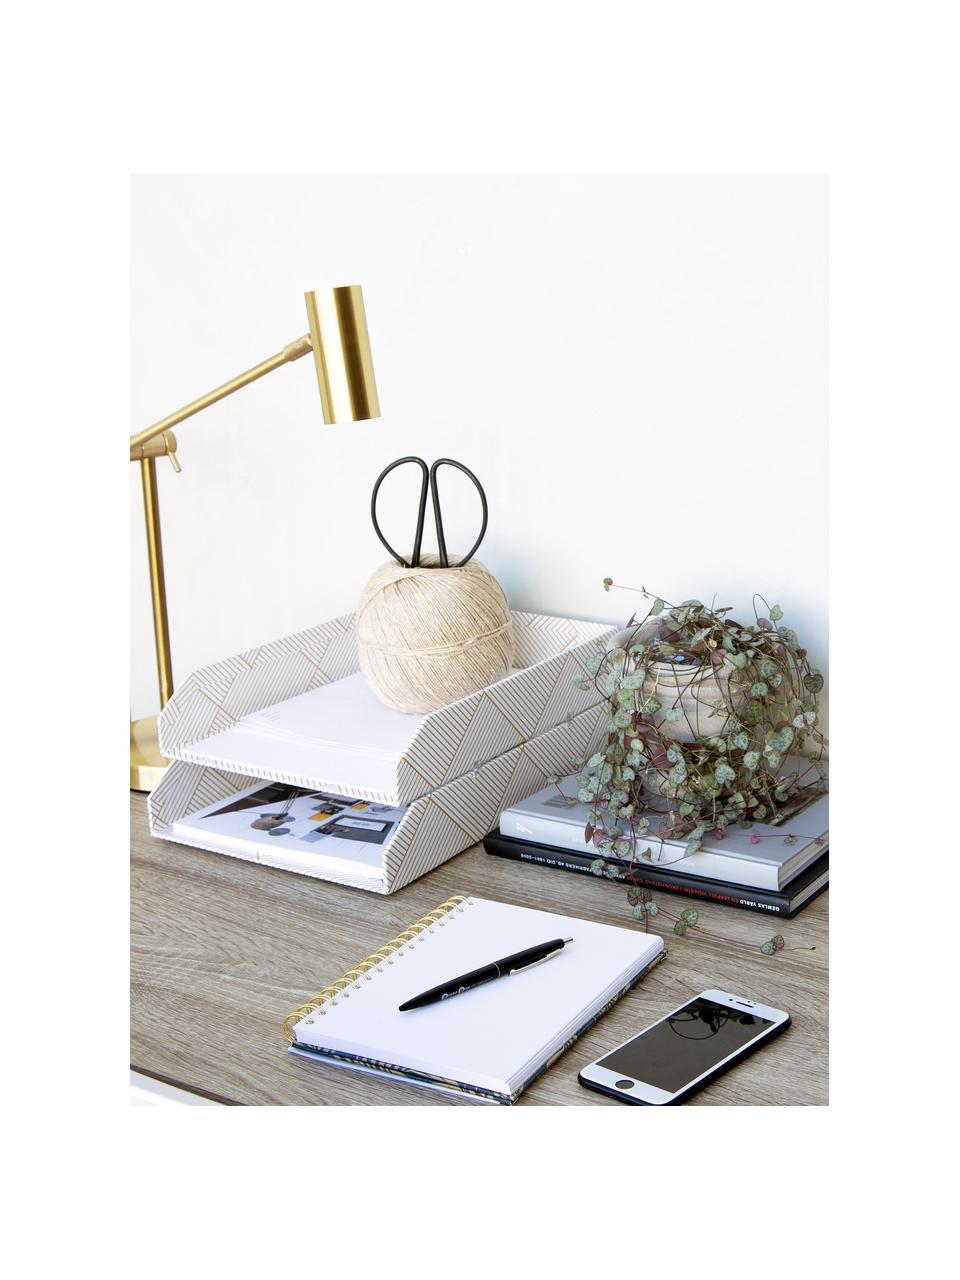 Dokumenten-Ablagen Hakan, 2 Stück, Fester, laminierter Karton, Goldfarben, Weiß, B 23 x T 31 cm